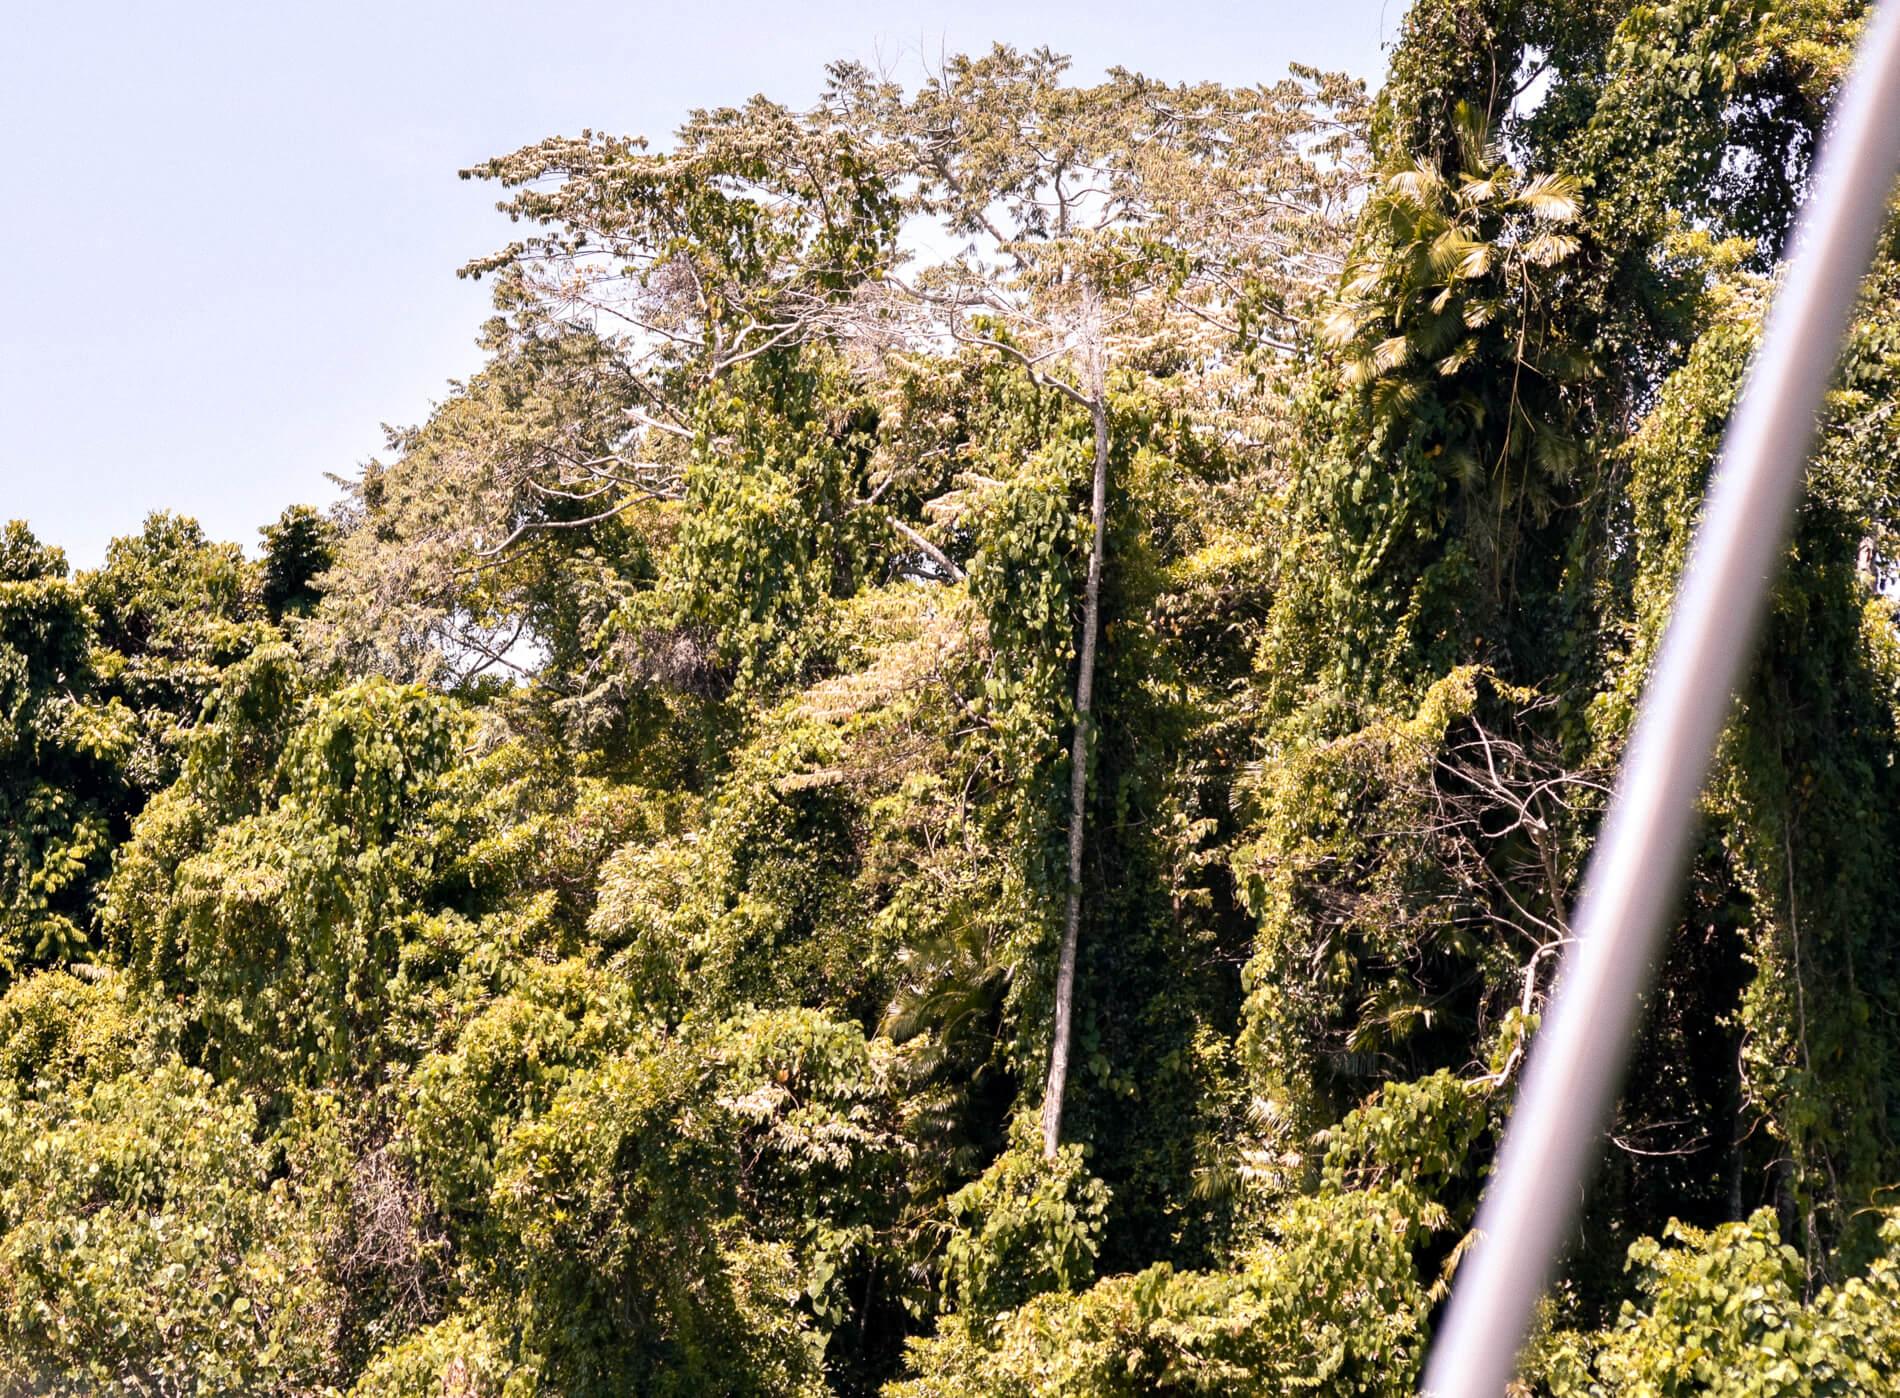 Rugged vegetation of the Daintree Rainforest - oldest rainforest in the world